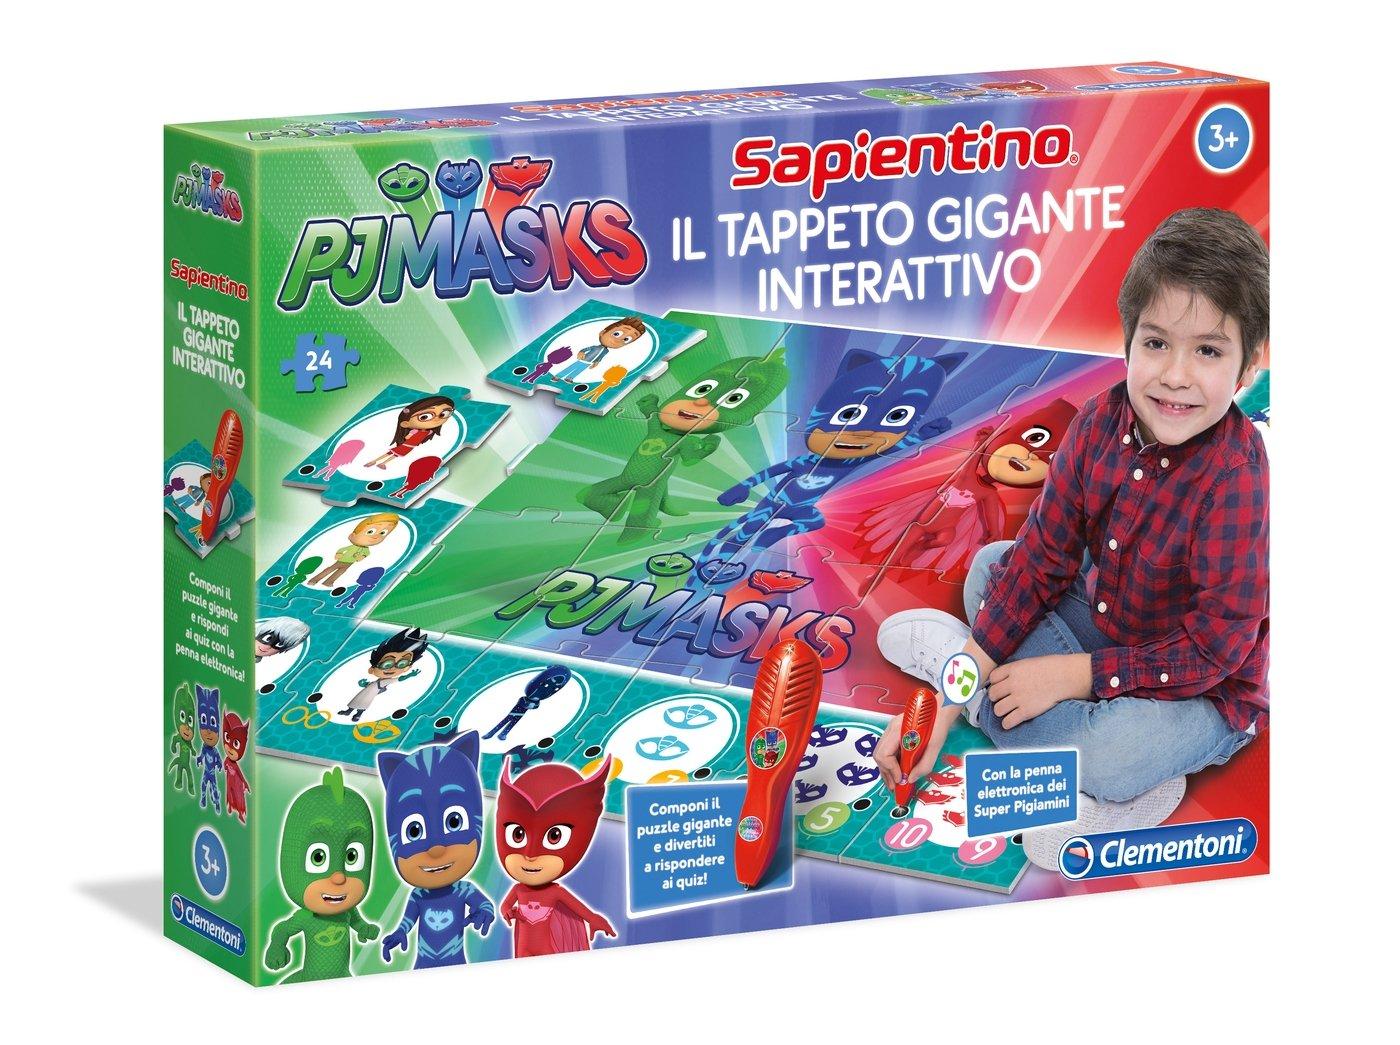 Clementoni 13304 - Frozen Tappeto Gigante Interattivo Clementoni Spa Italy